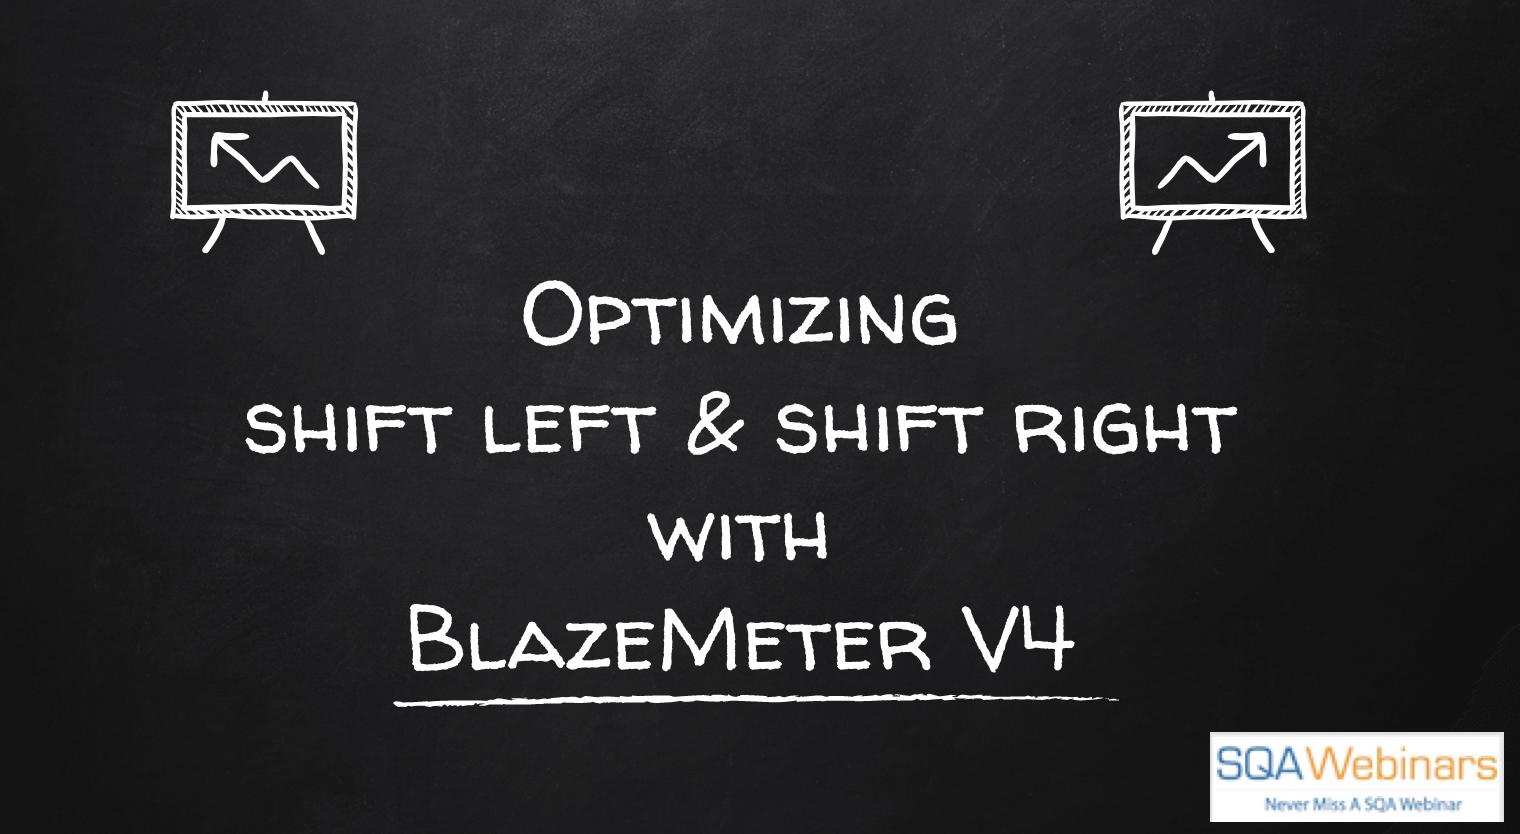 SQAWebinar662:Optimizing Shift Left & Shift Right with New BlazeMeter V4  #SQAWebinars23Jan2019 #Blazemeter #Broadcom